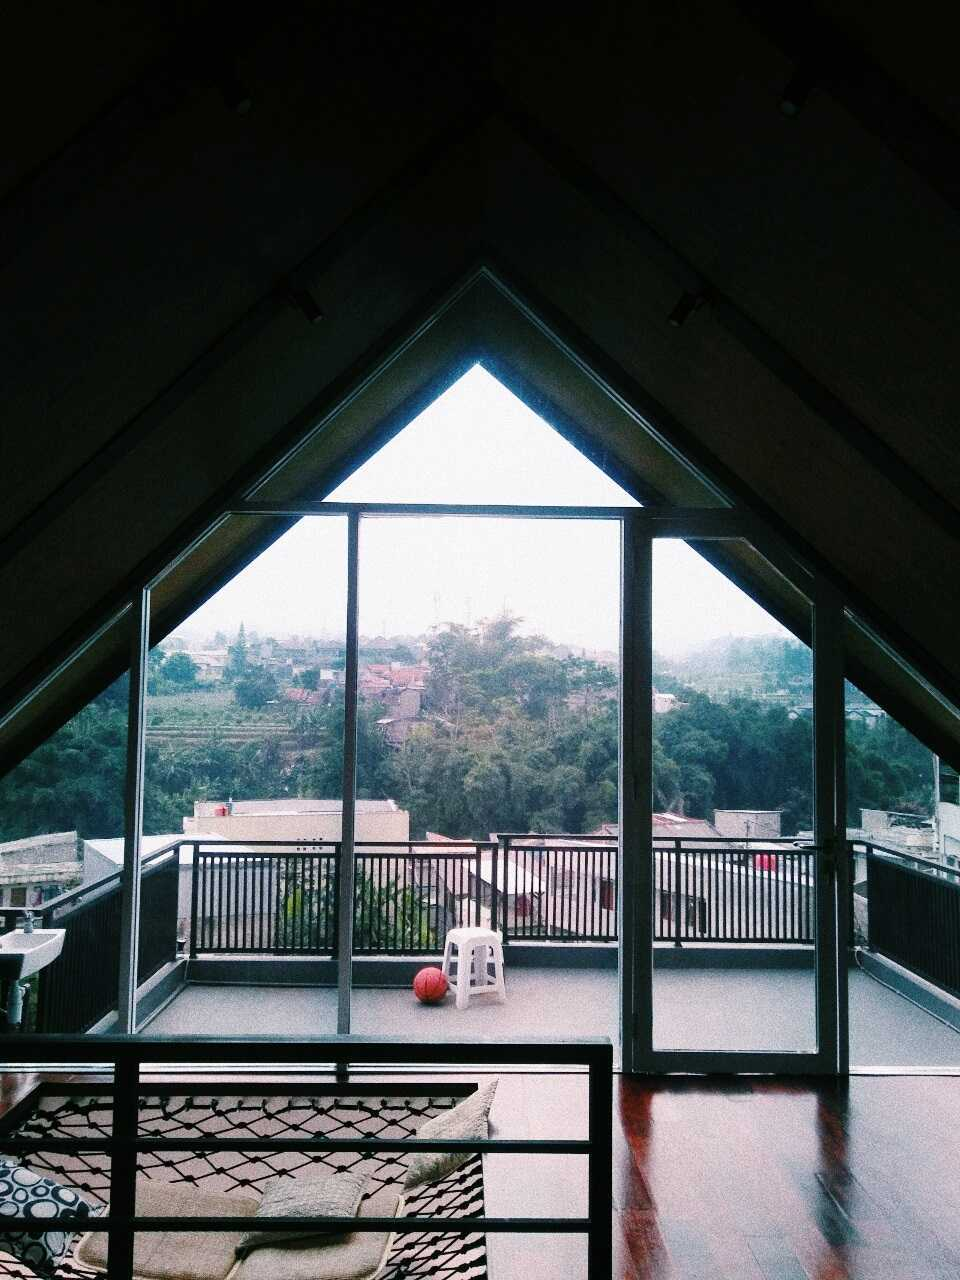 Qavah Architect Attic House Renovation Gegerkalong, Kec. Sukasari, Kota Bandung, Jawa Barat, Indonesia Gegerkalong, Kec. Sukasari, Kota Bandung, Jawa Barat, Indonesia Qavah-Architect-Attic-House-Renovation  90453